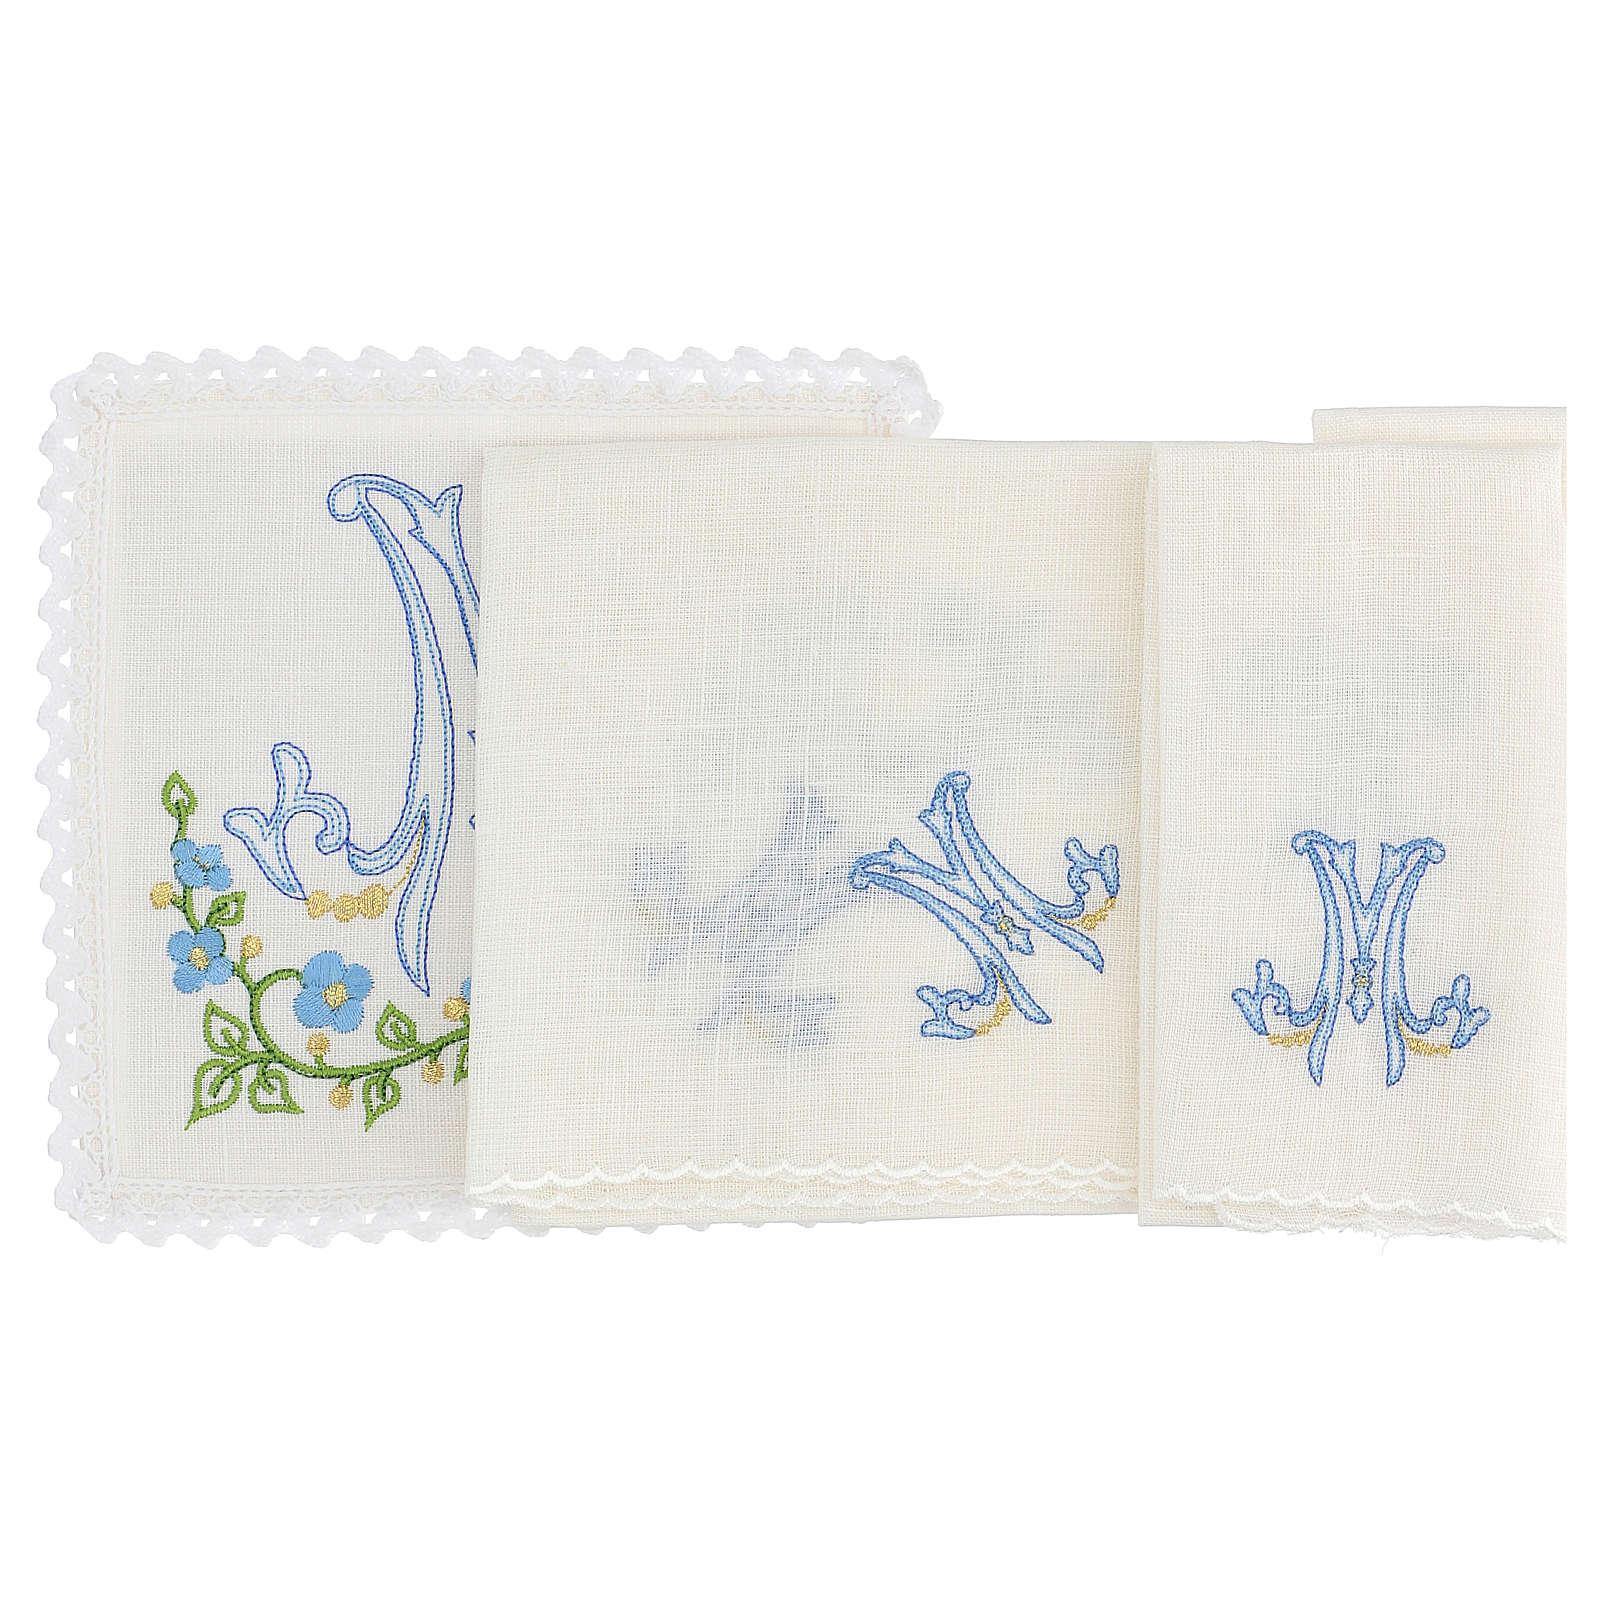 Service linge d'autel 100% lin symbole marial bleu 4